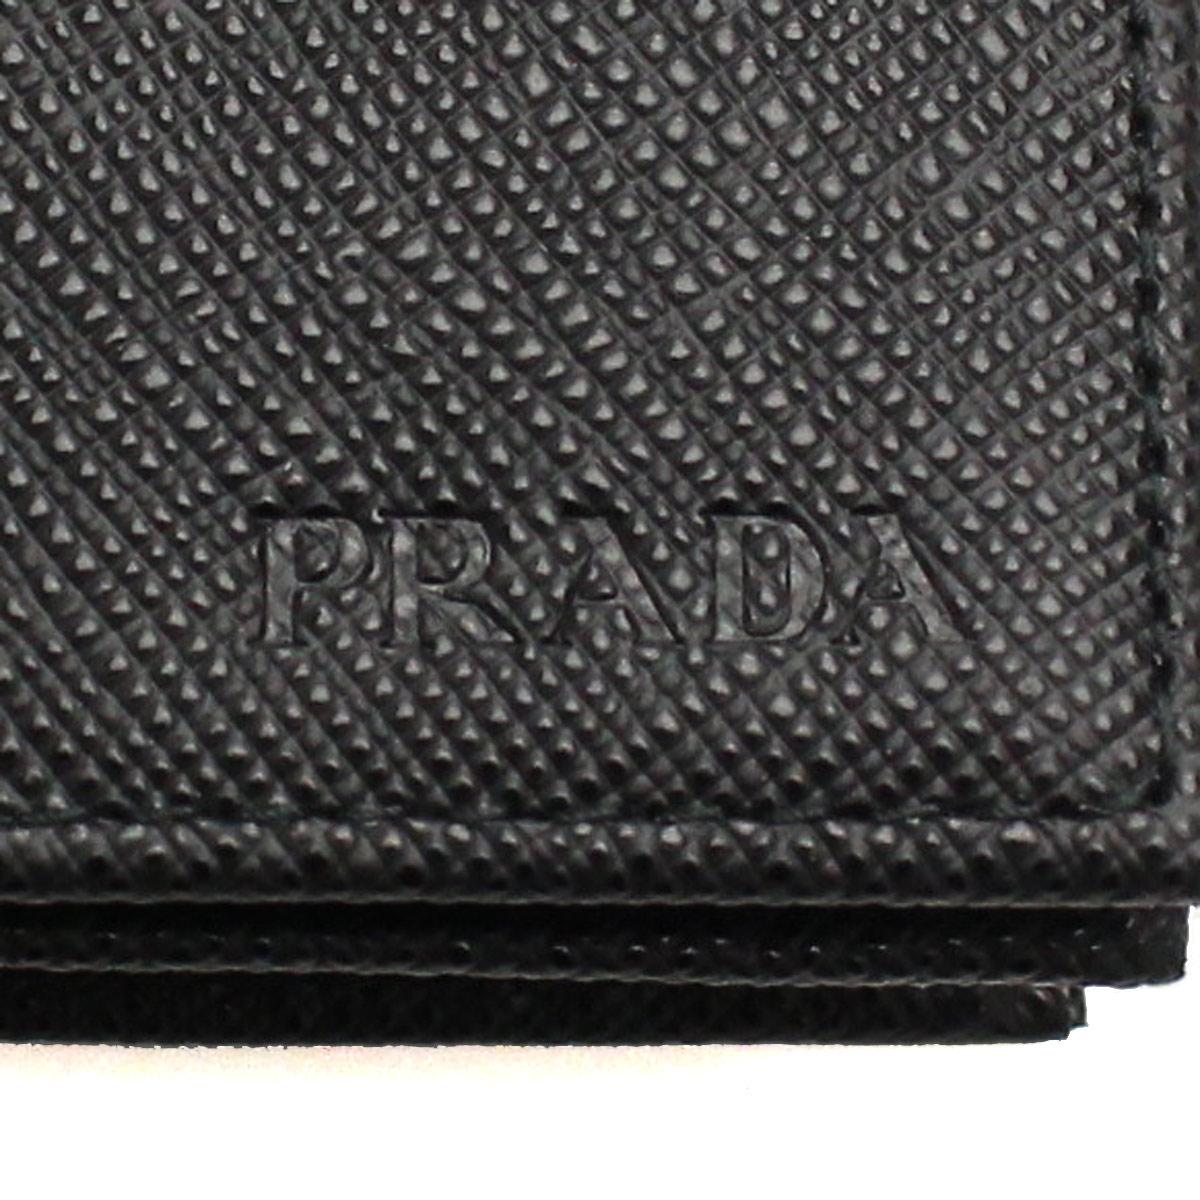 Bighit The total brand wholesale | Rakuten Global Market: Prada ...